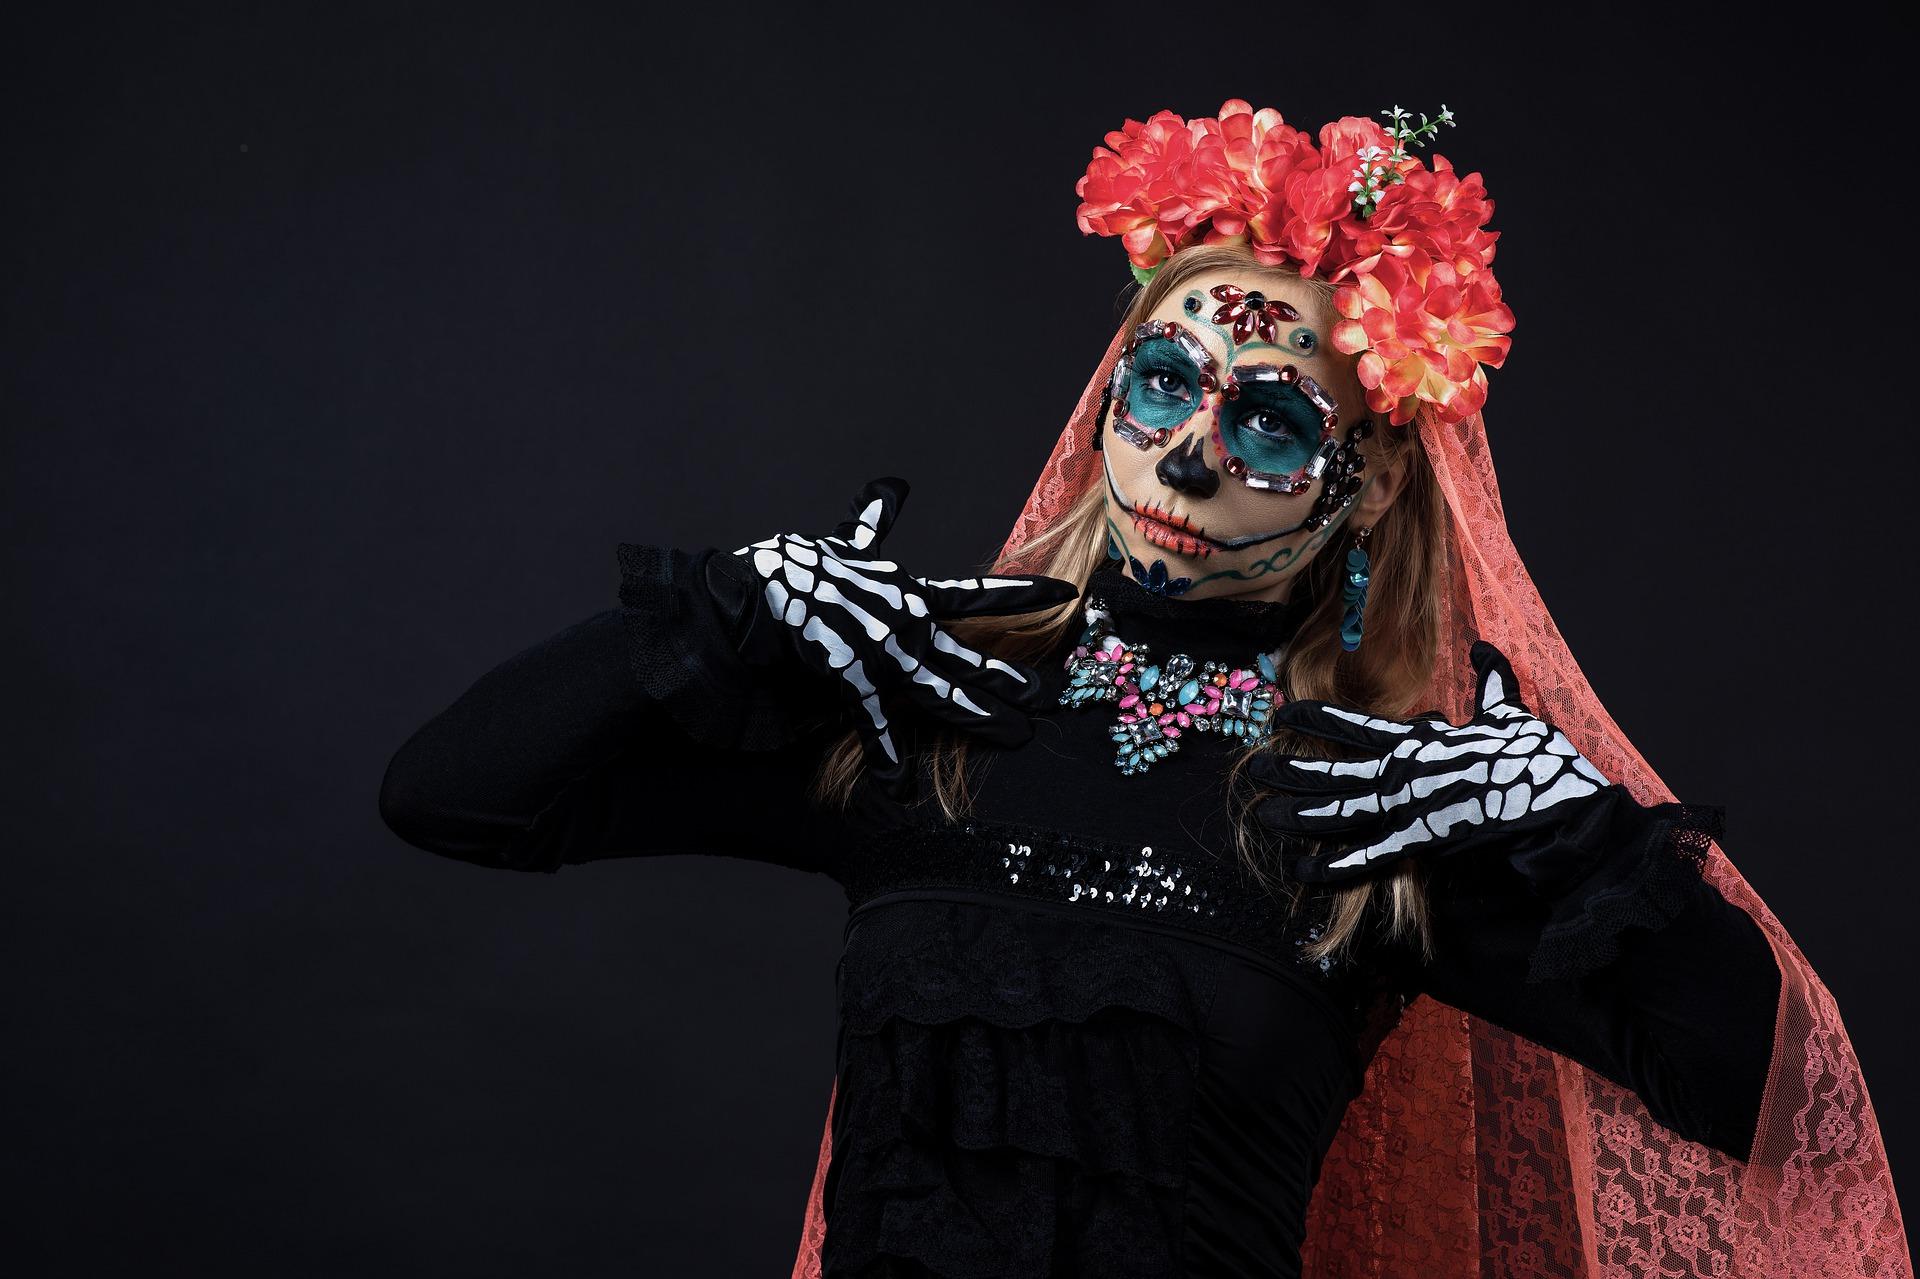 woman-wearing-la-calavera-catrina-inspired-outfit